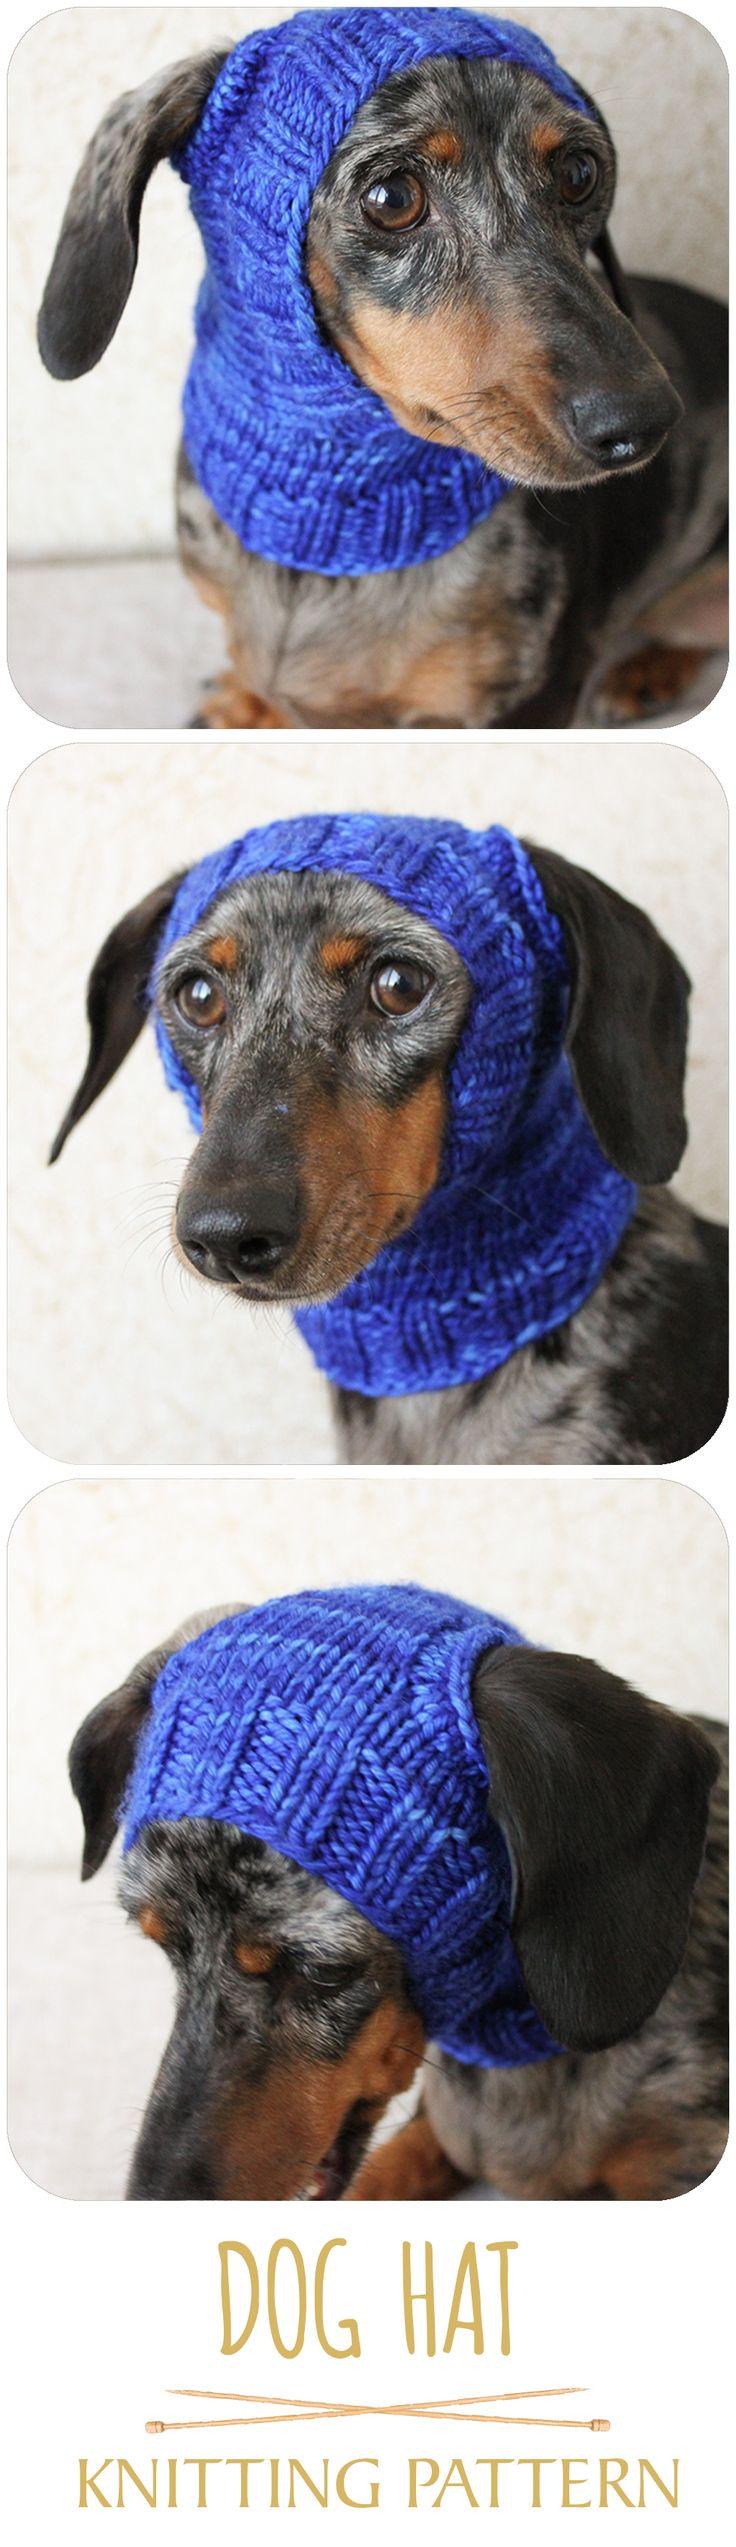 KNITTING PATTERN, Mini Dachshund Dog Hat, Small Dog Hat